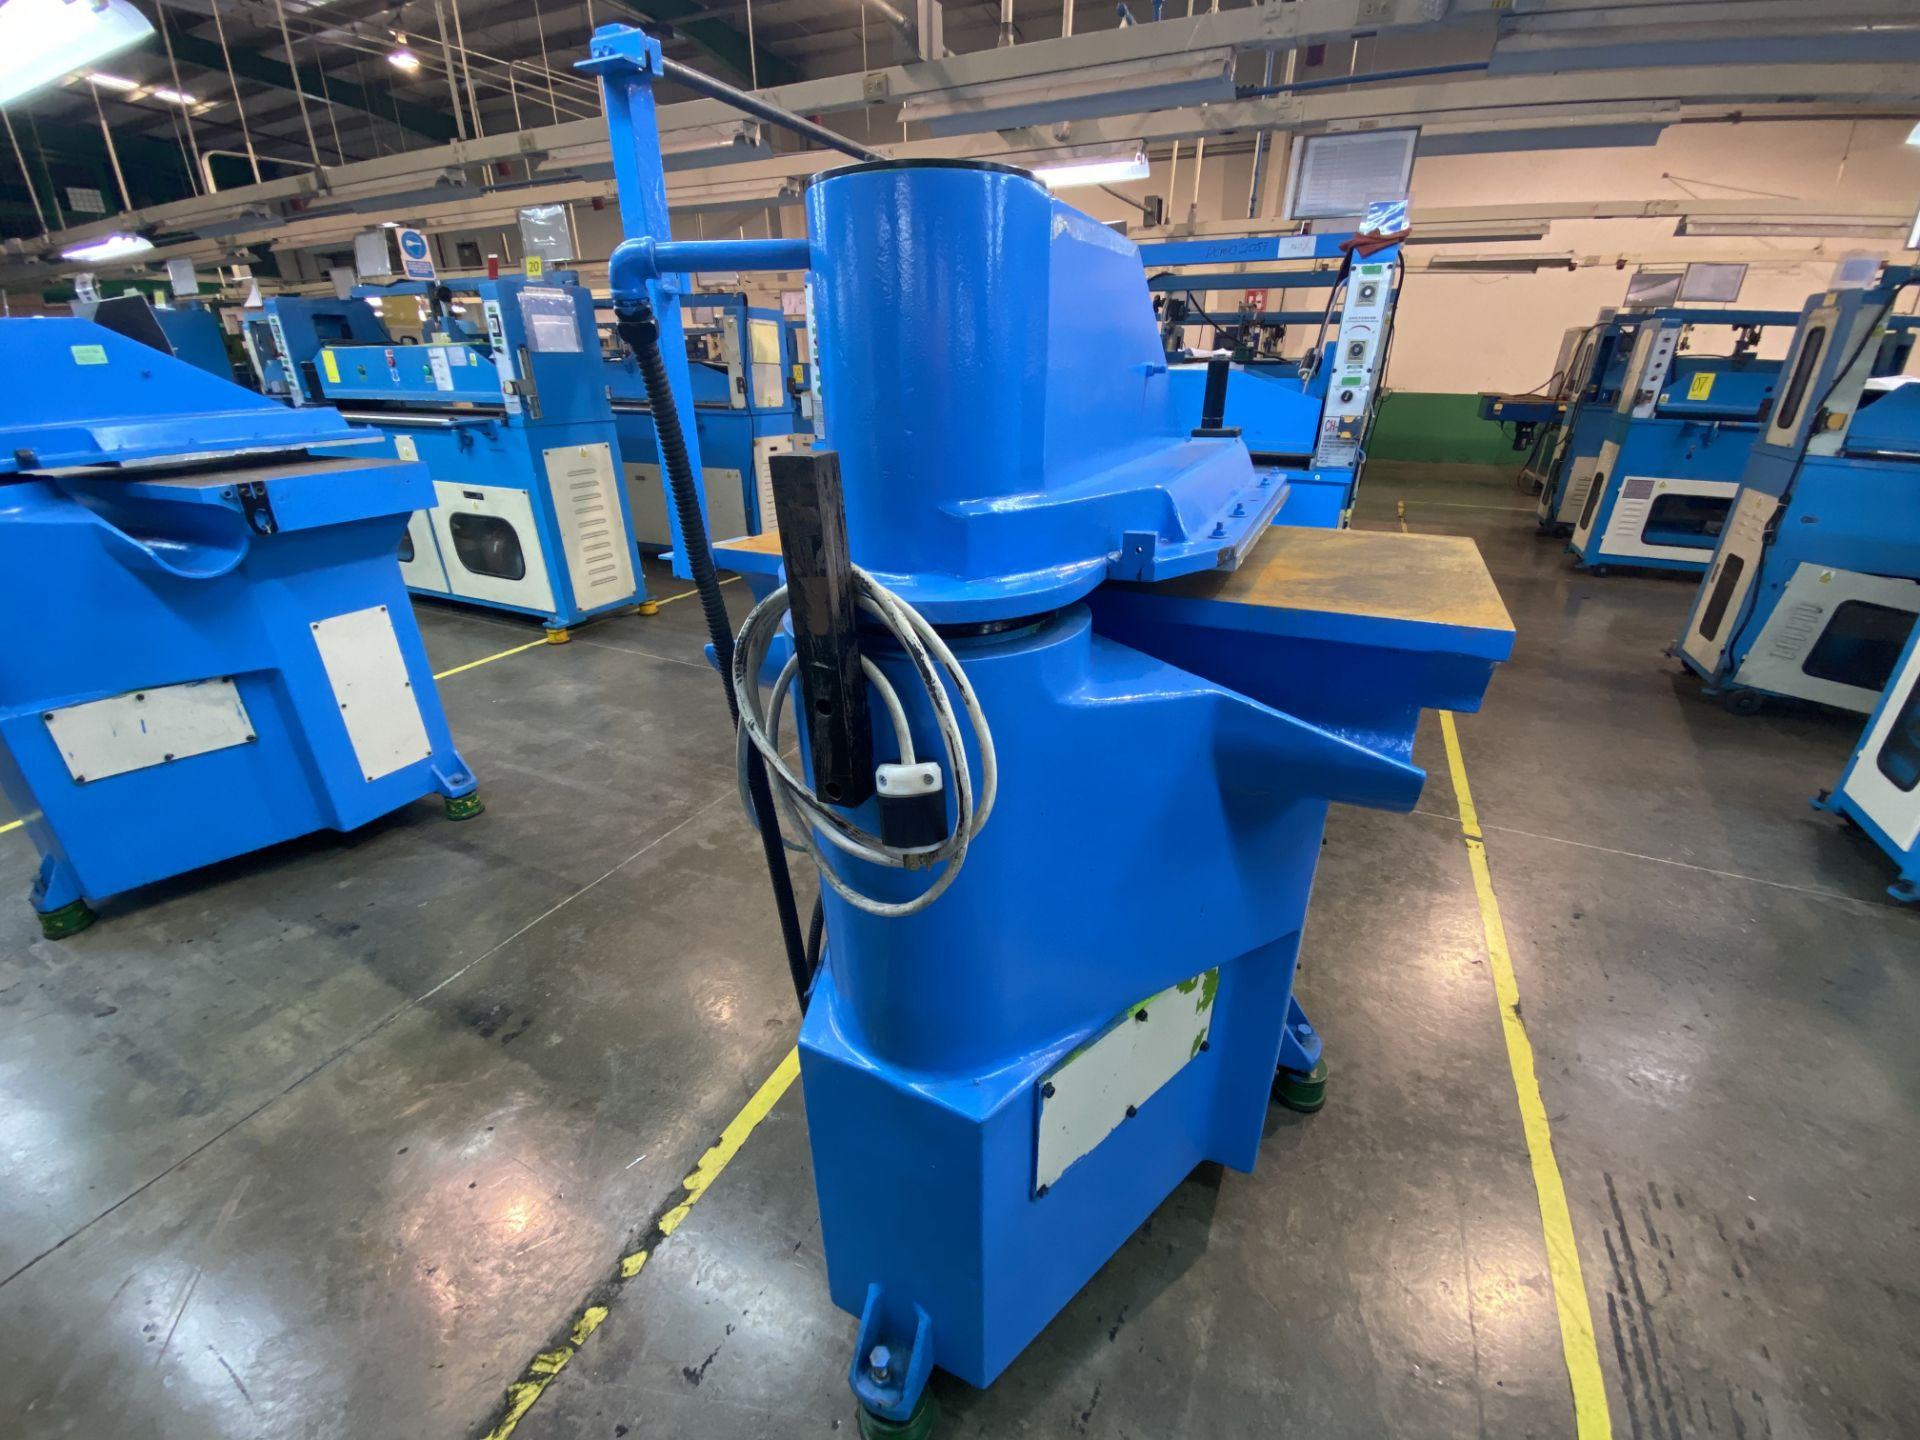 Lot 19 - (2) Prensas de corte hidráulica de brazo oscilante, marca Ying Hui Machine, Modelo: YG-520